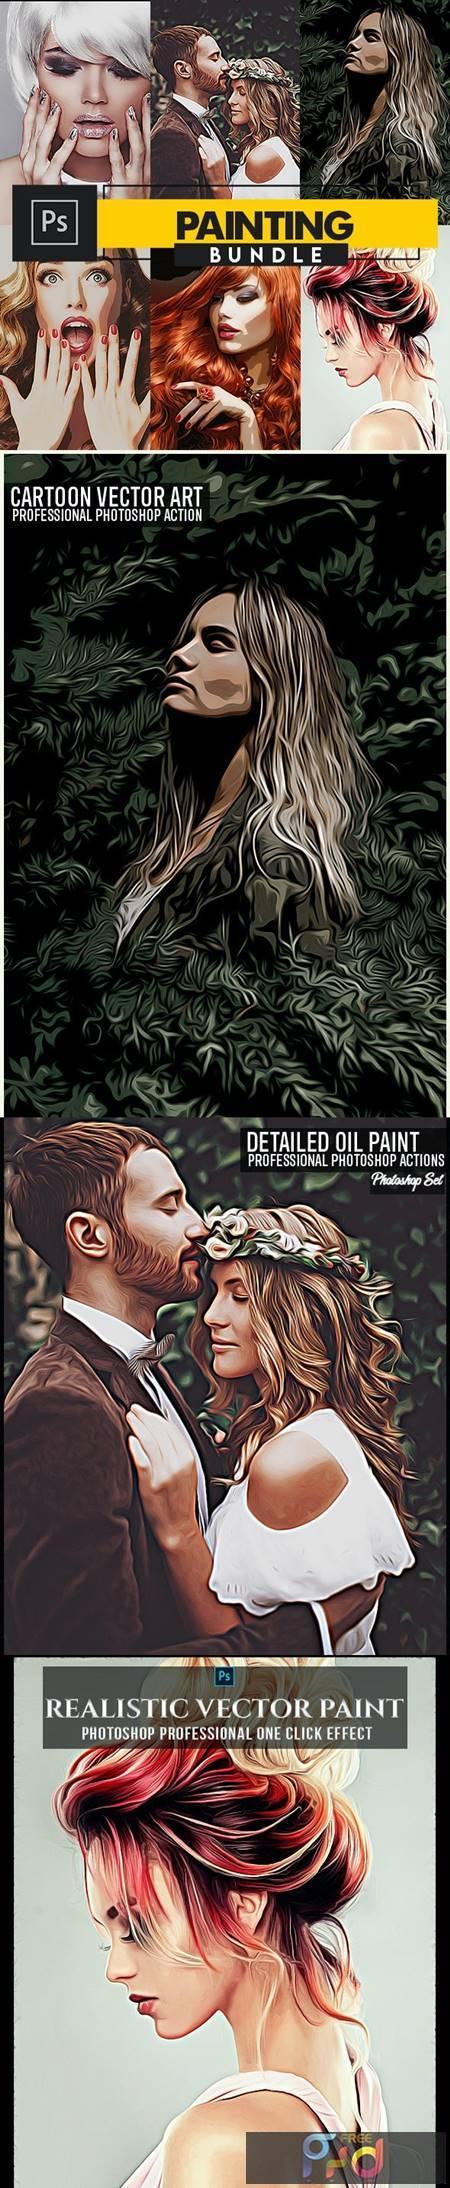 Painting Photoshop Actions Bundle 28379976 1